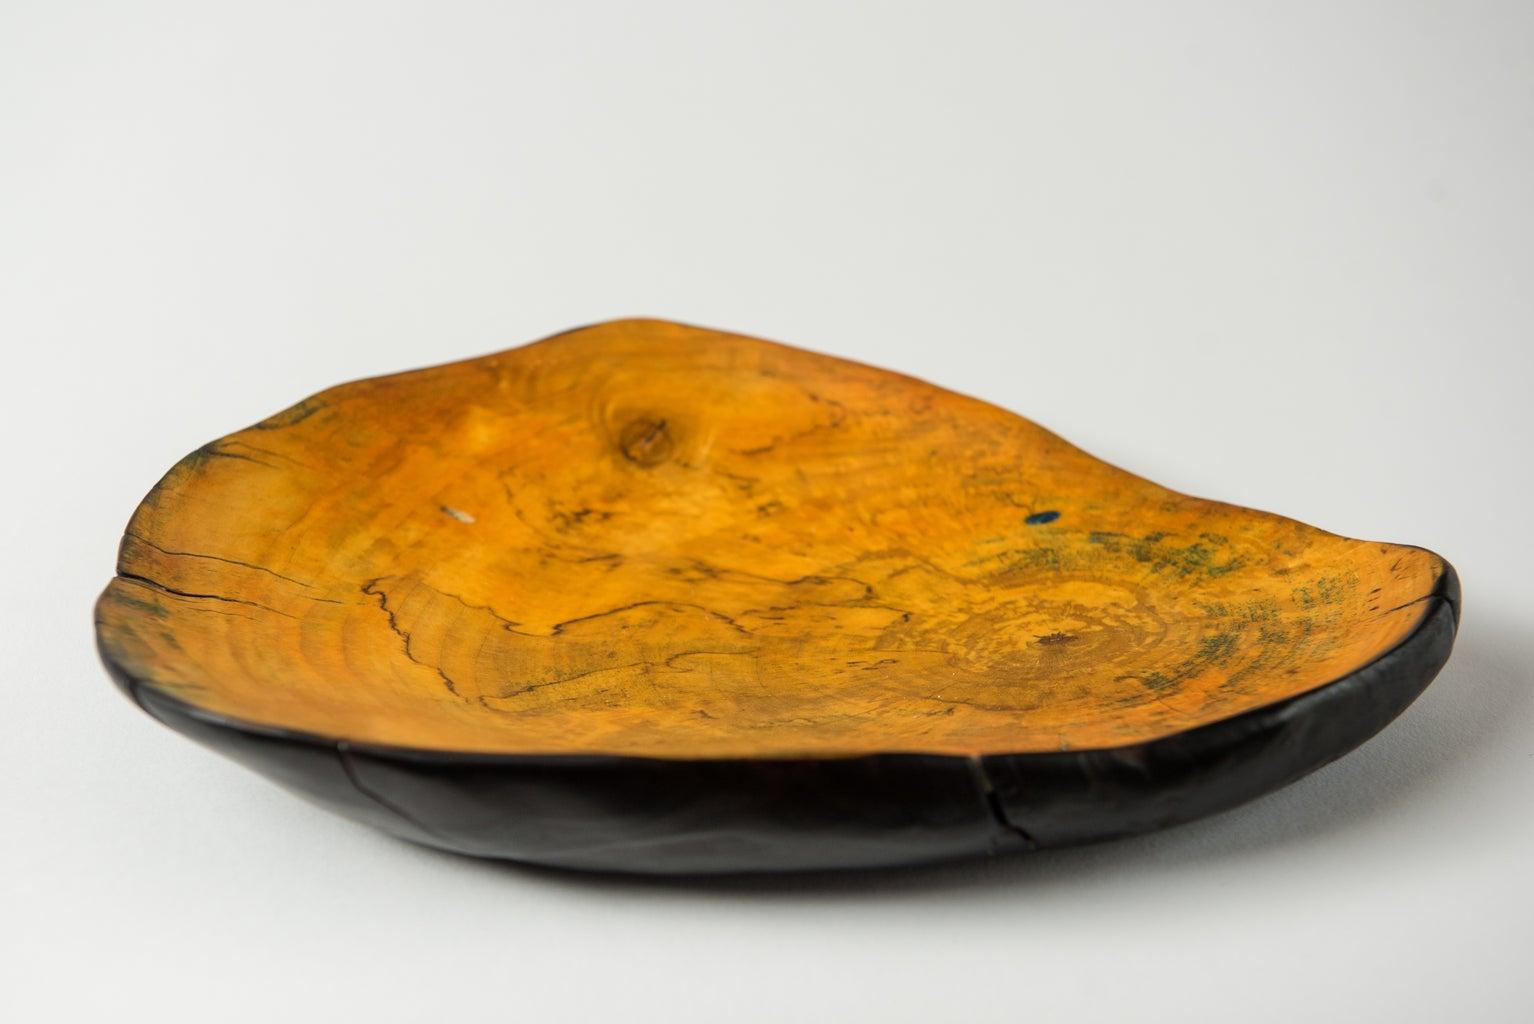 Making a Bowl Without a Lathe